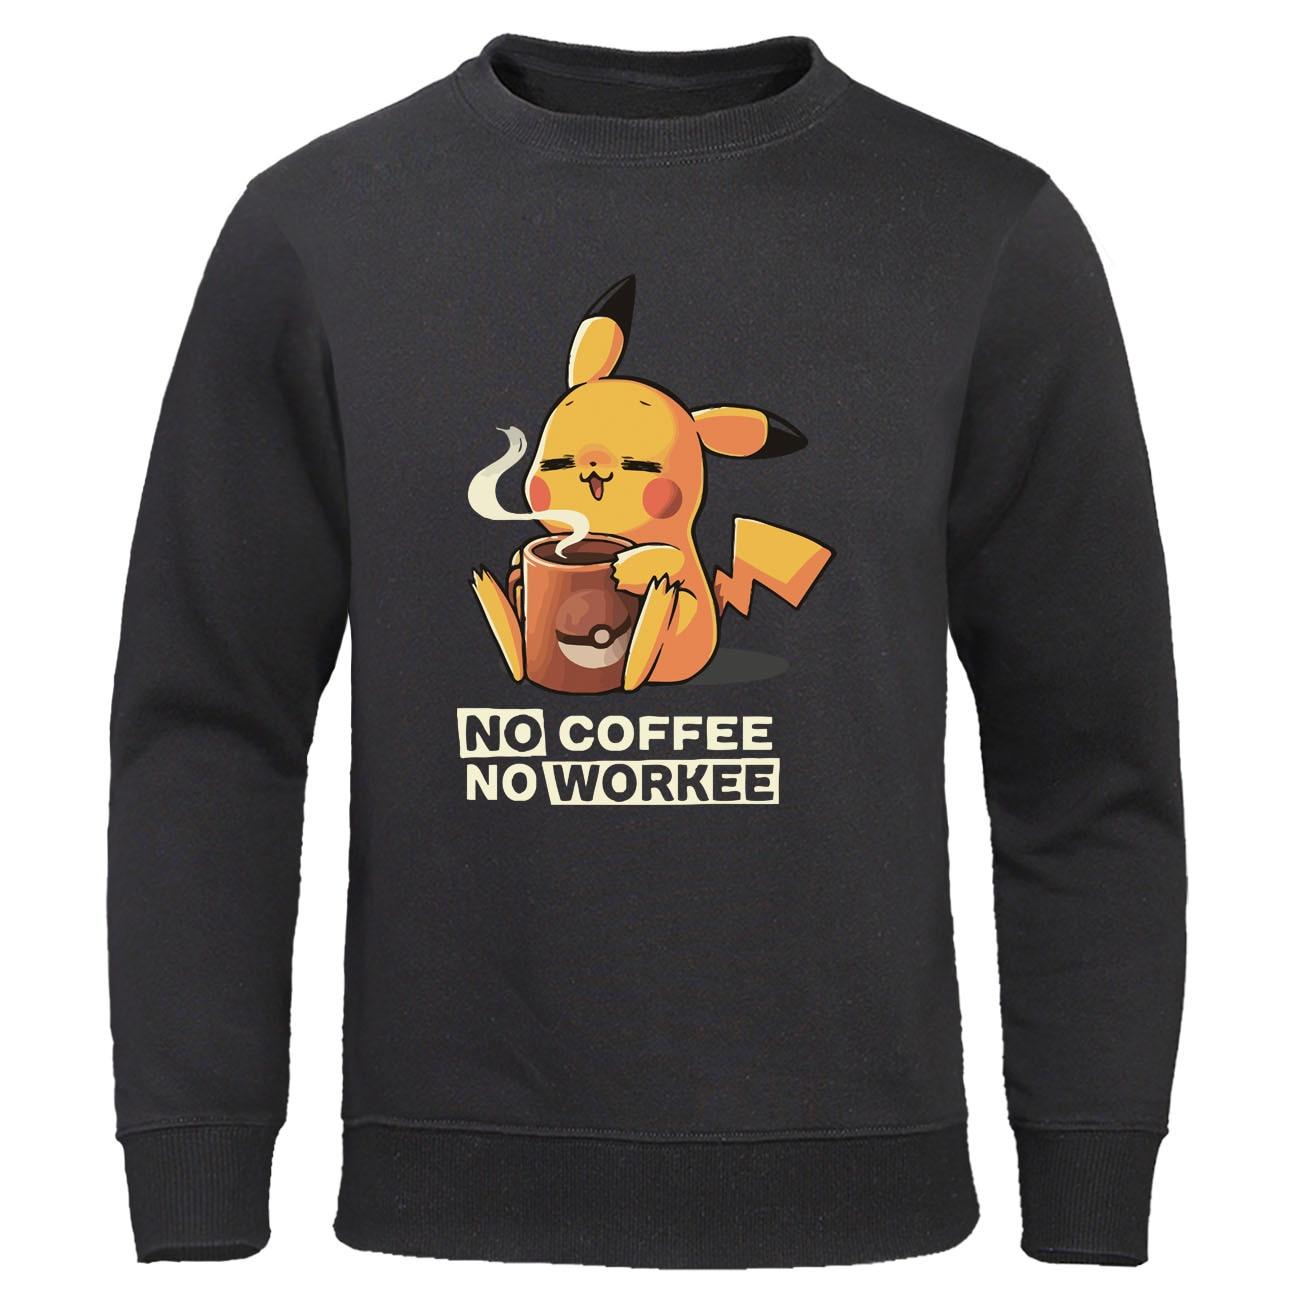 Pikachu Pokemon Sweatshirt NO COFFEE NO WORKEE Hoodies Casual Mens Anime Pullover Funny Cartoon Men Hoodie Harajuku Streetwear